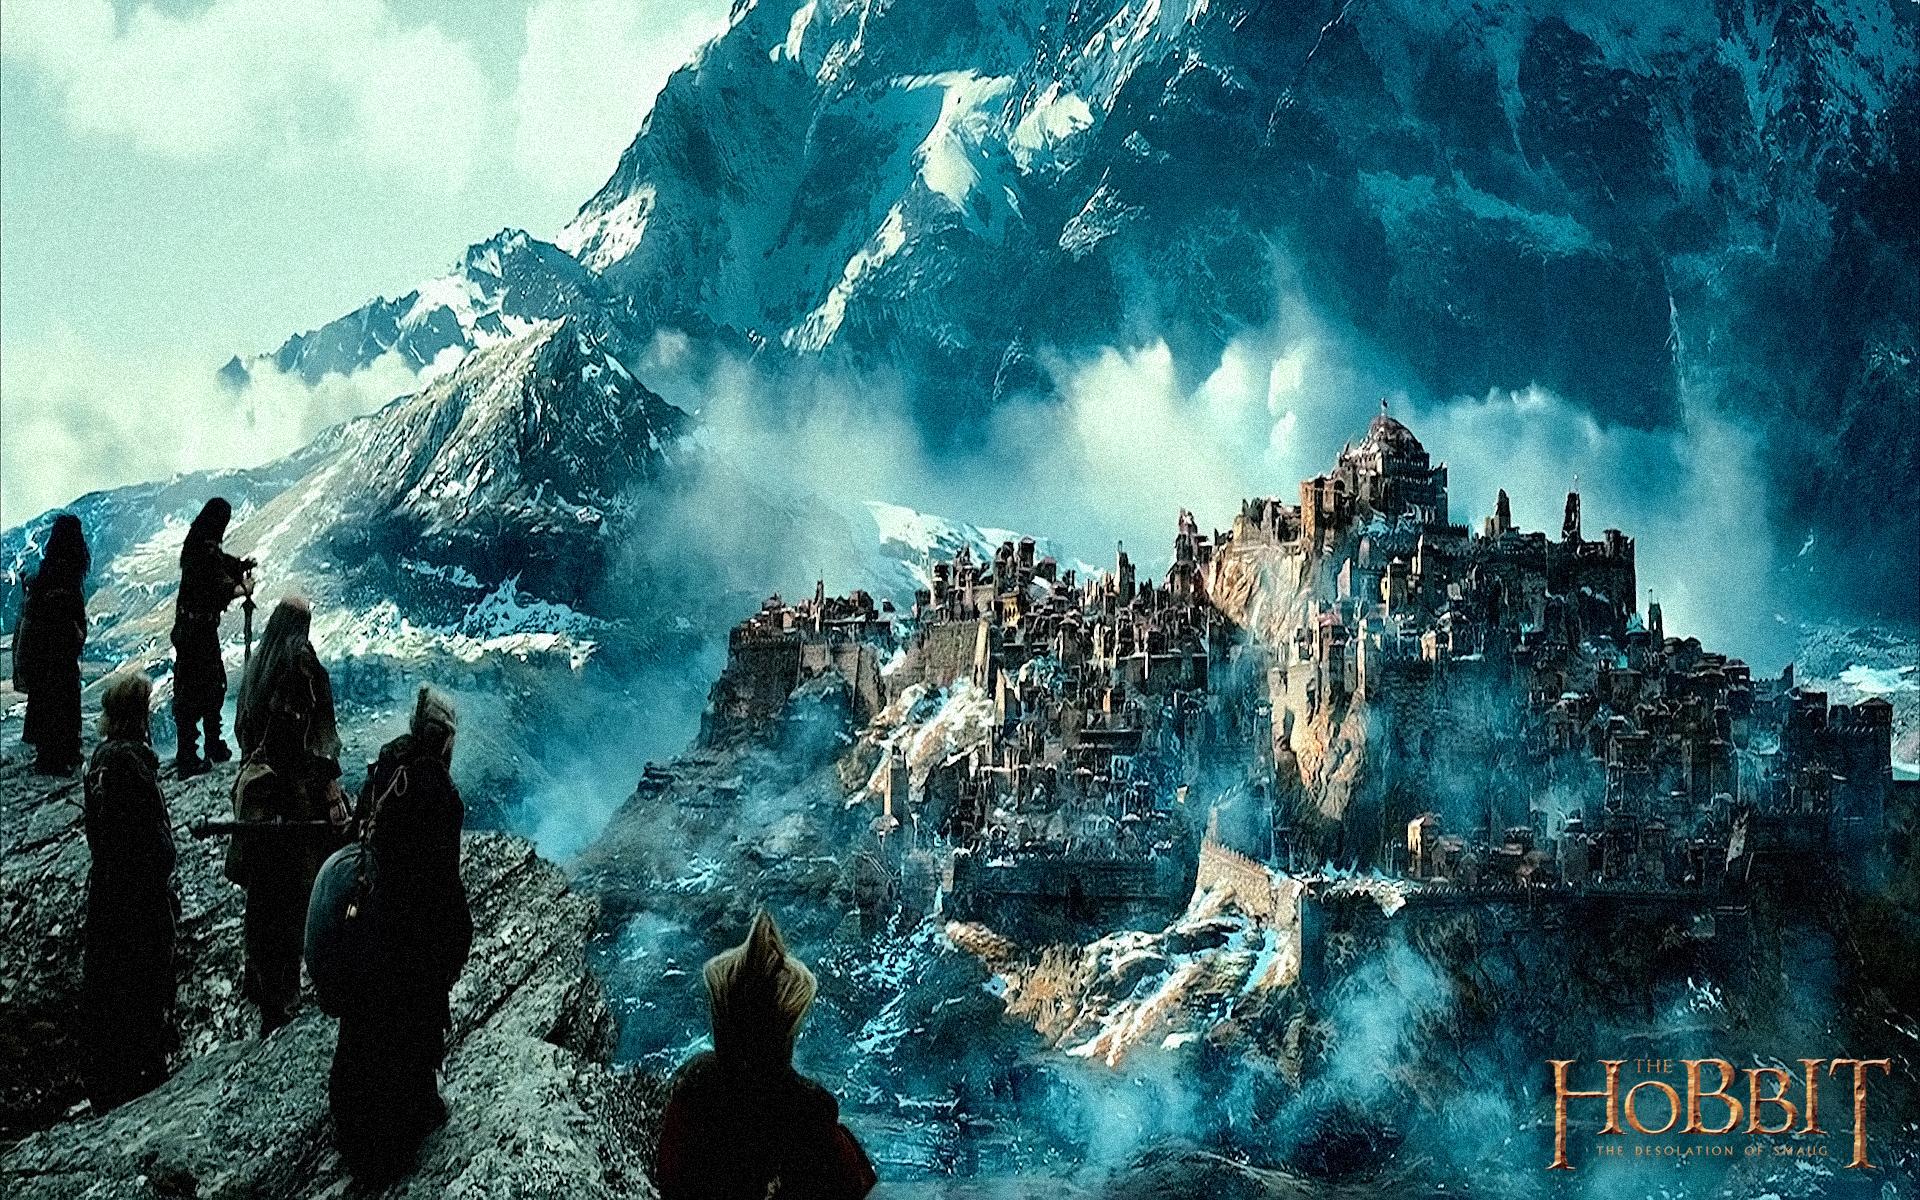 Film Trailer | The Hobbit: The Desolation of Smaug | AMONymous